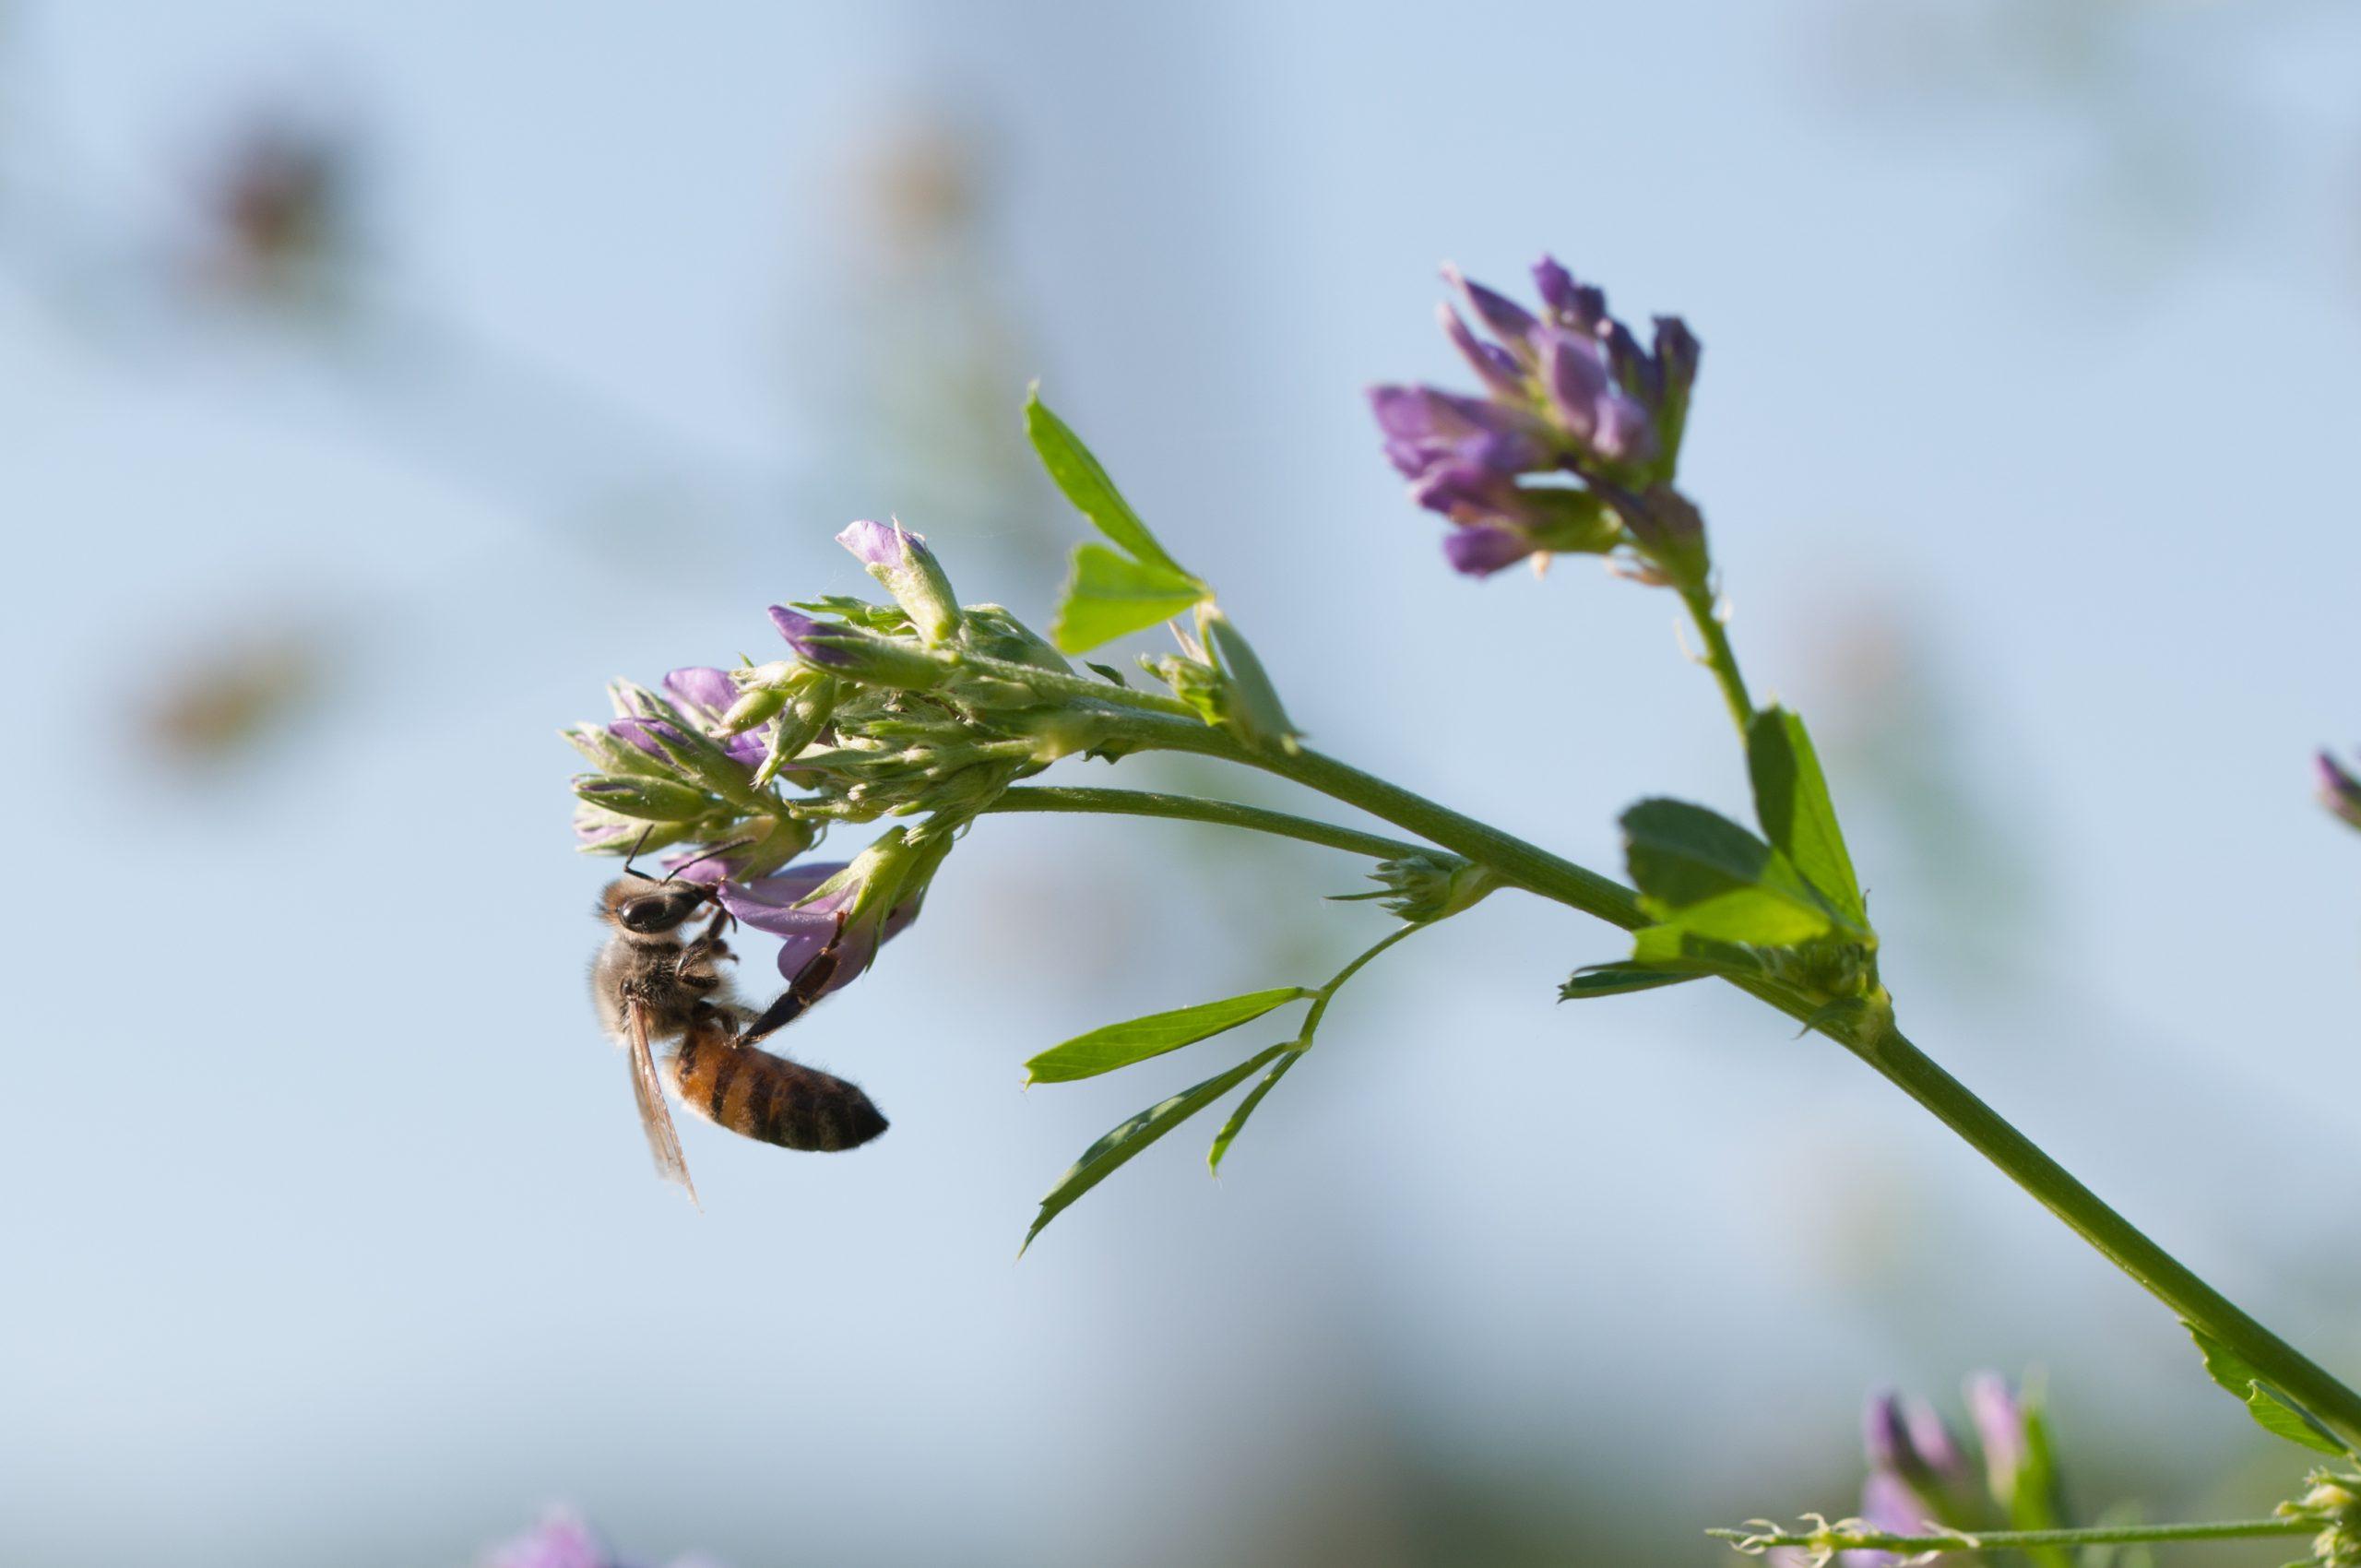 Honeybee Pollinating Alfalfa Flower